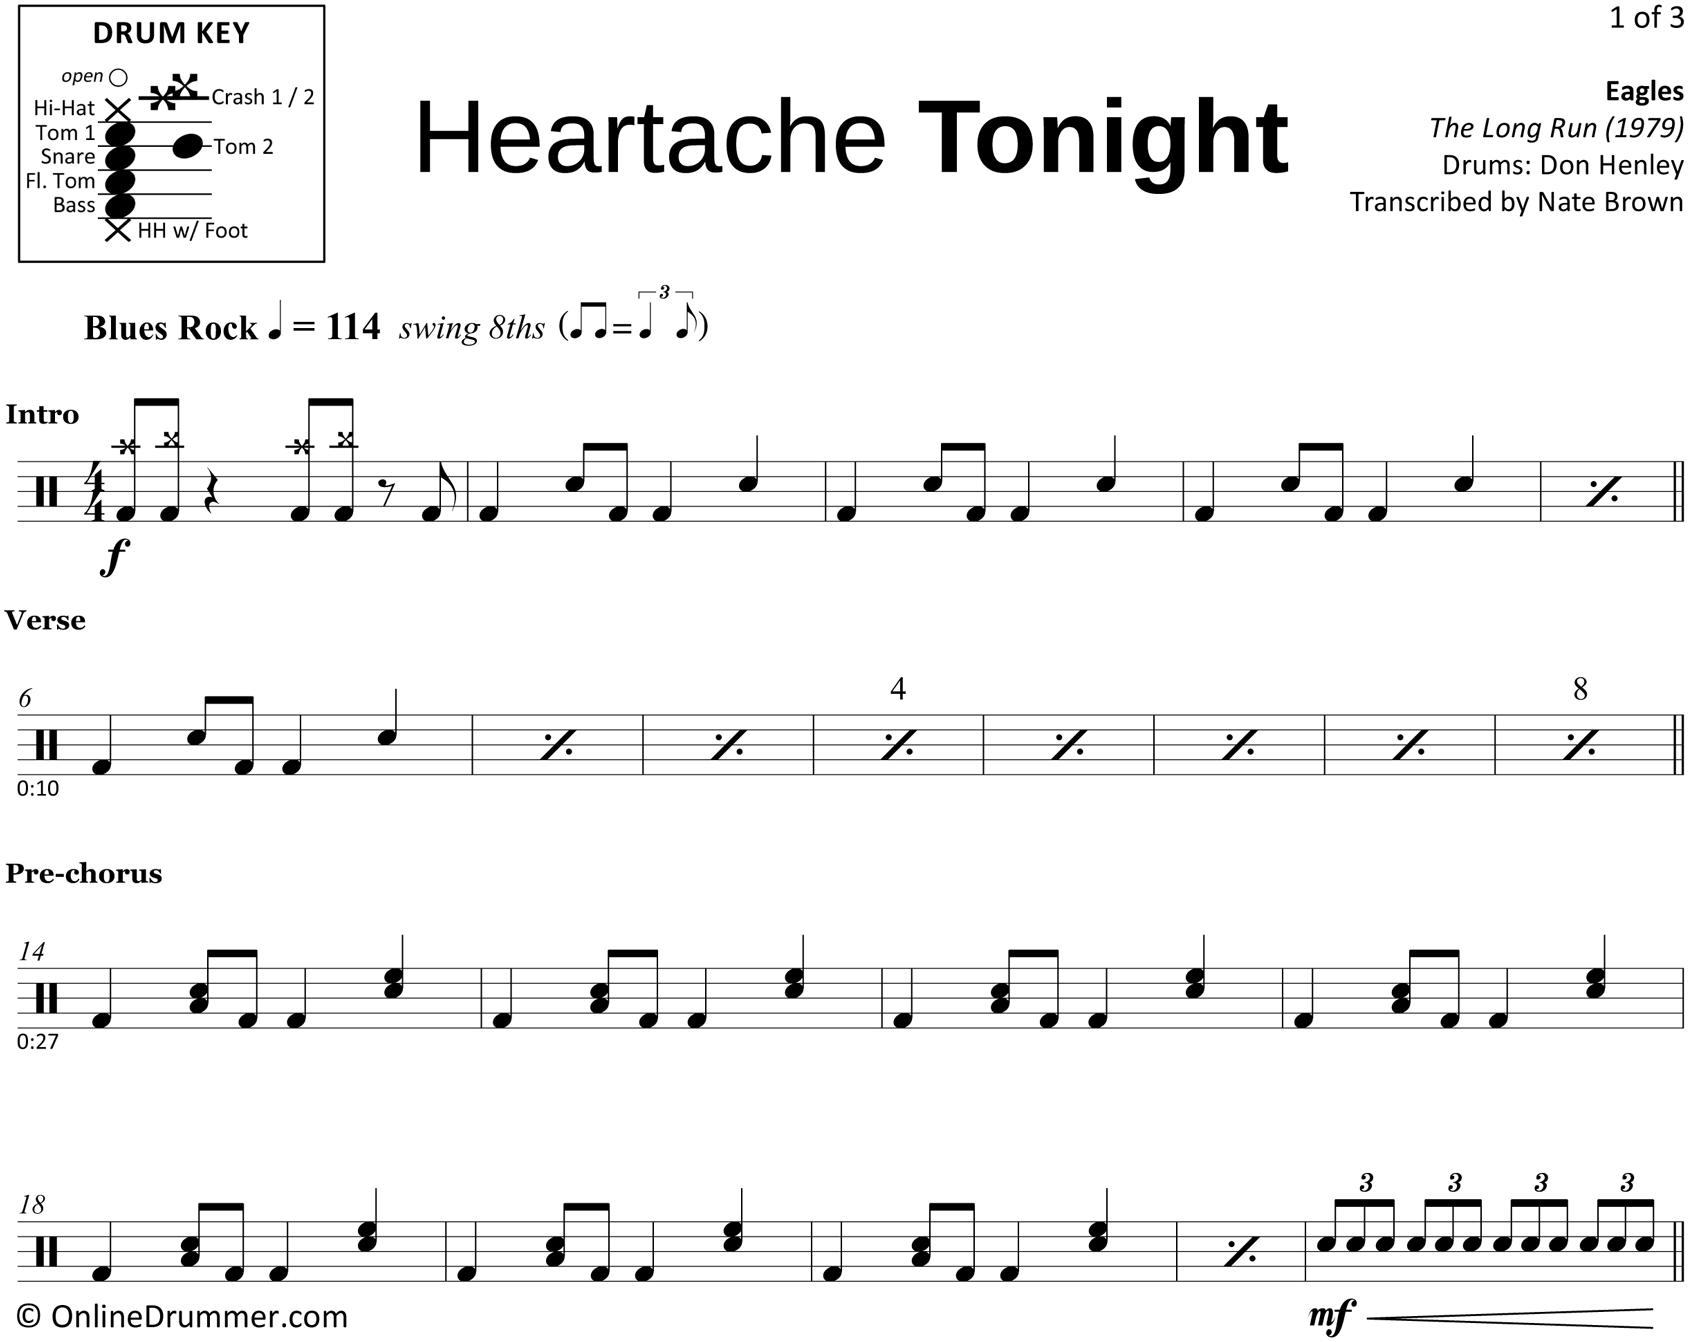 Heartache Tonight - Eagles - Drum Sheet Music